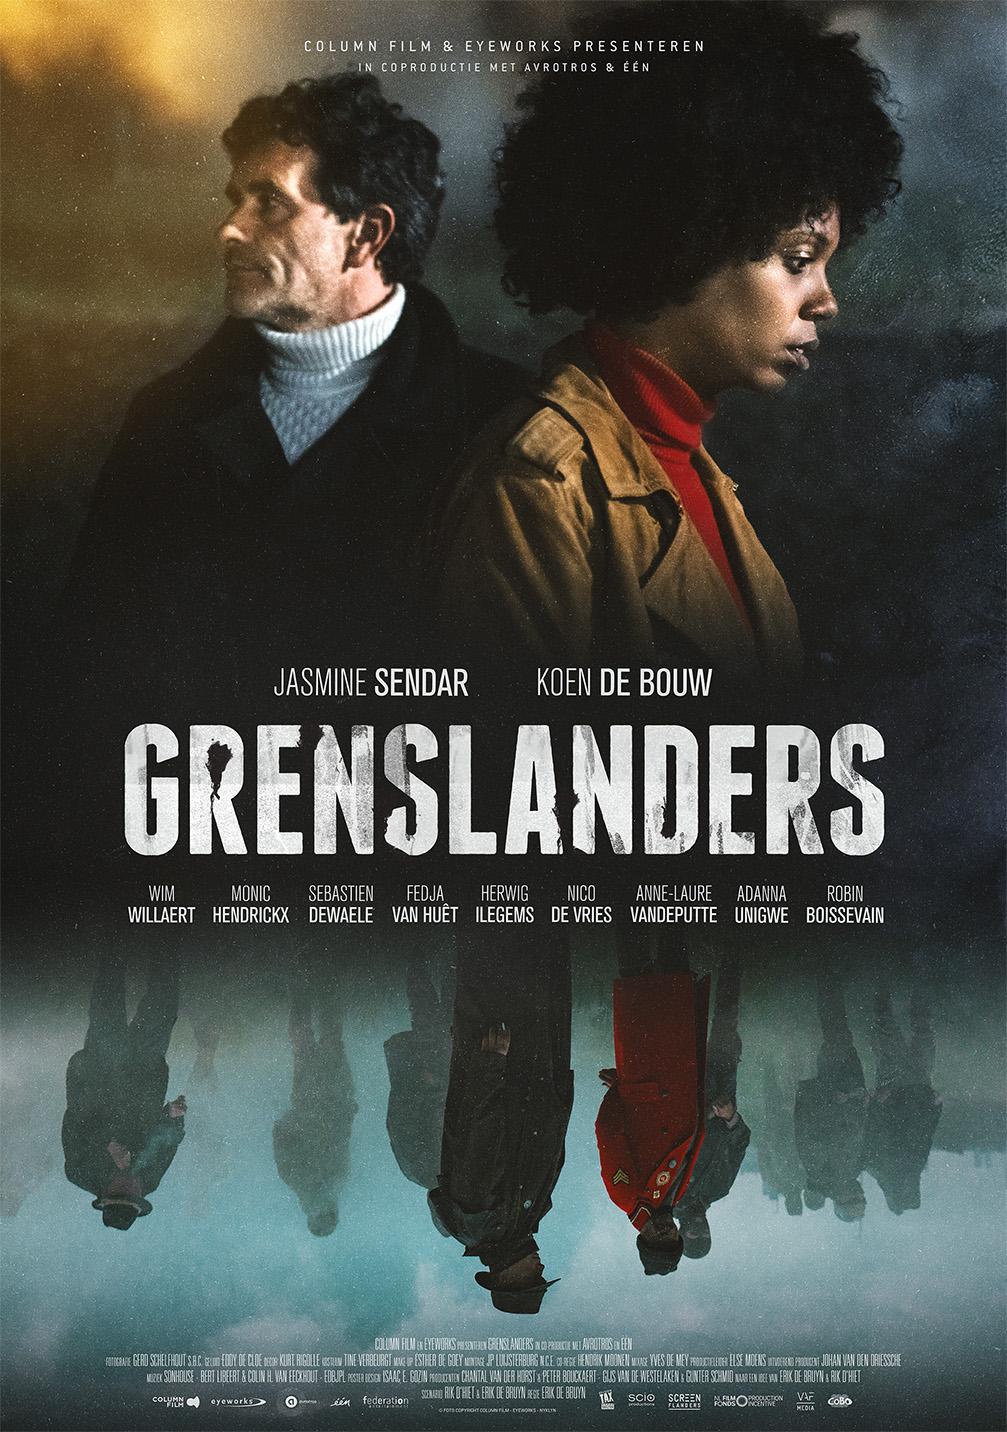 Grenslanders.S01E05.FLEMISH.WEB.H264-MERCATOR